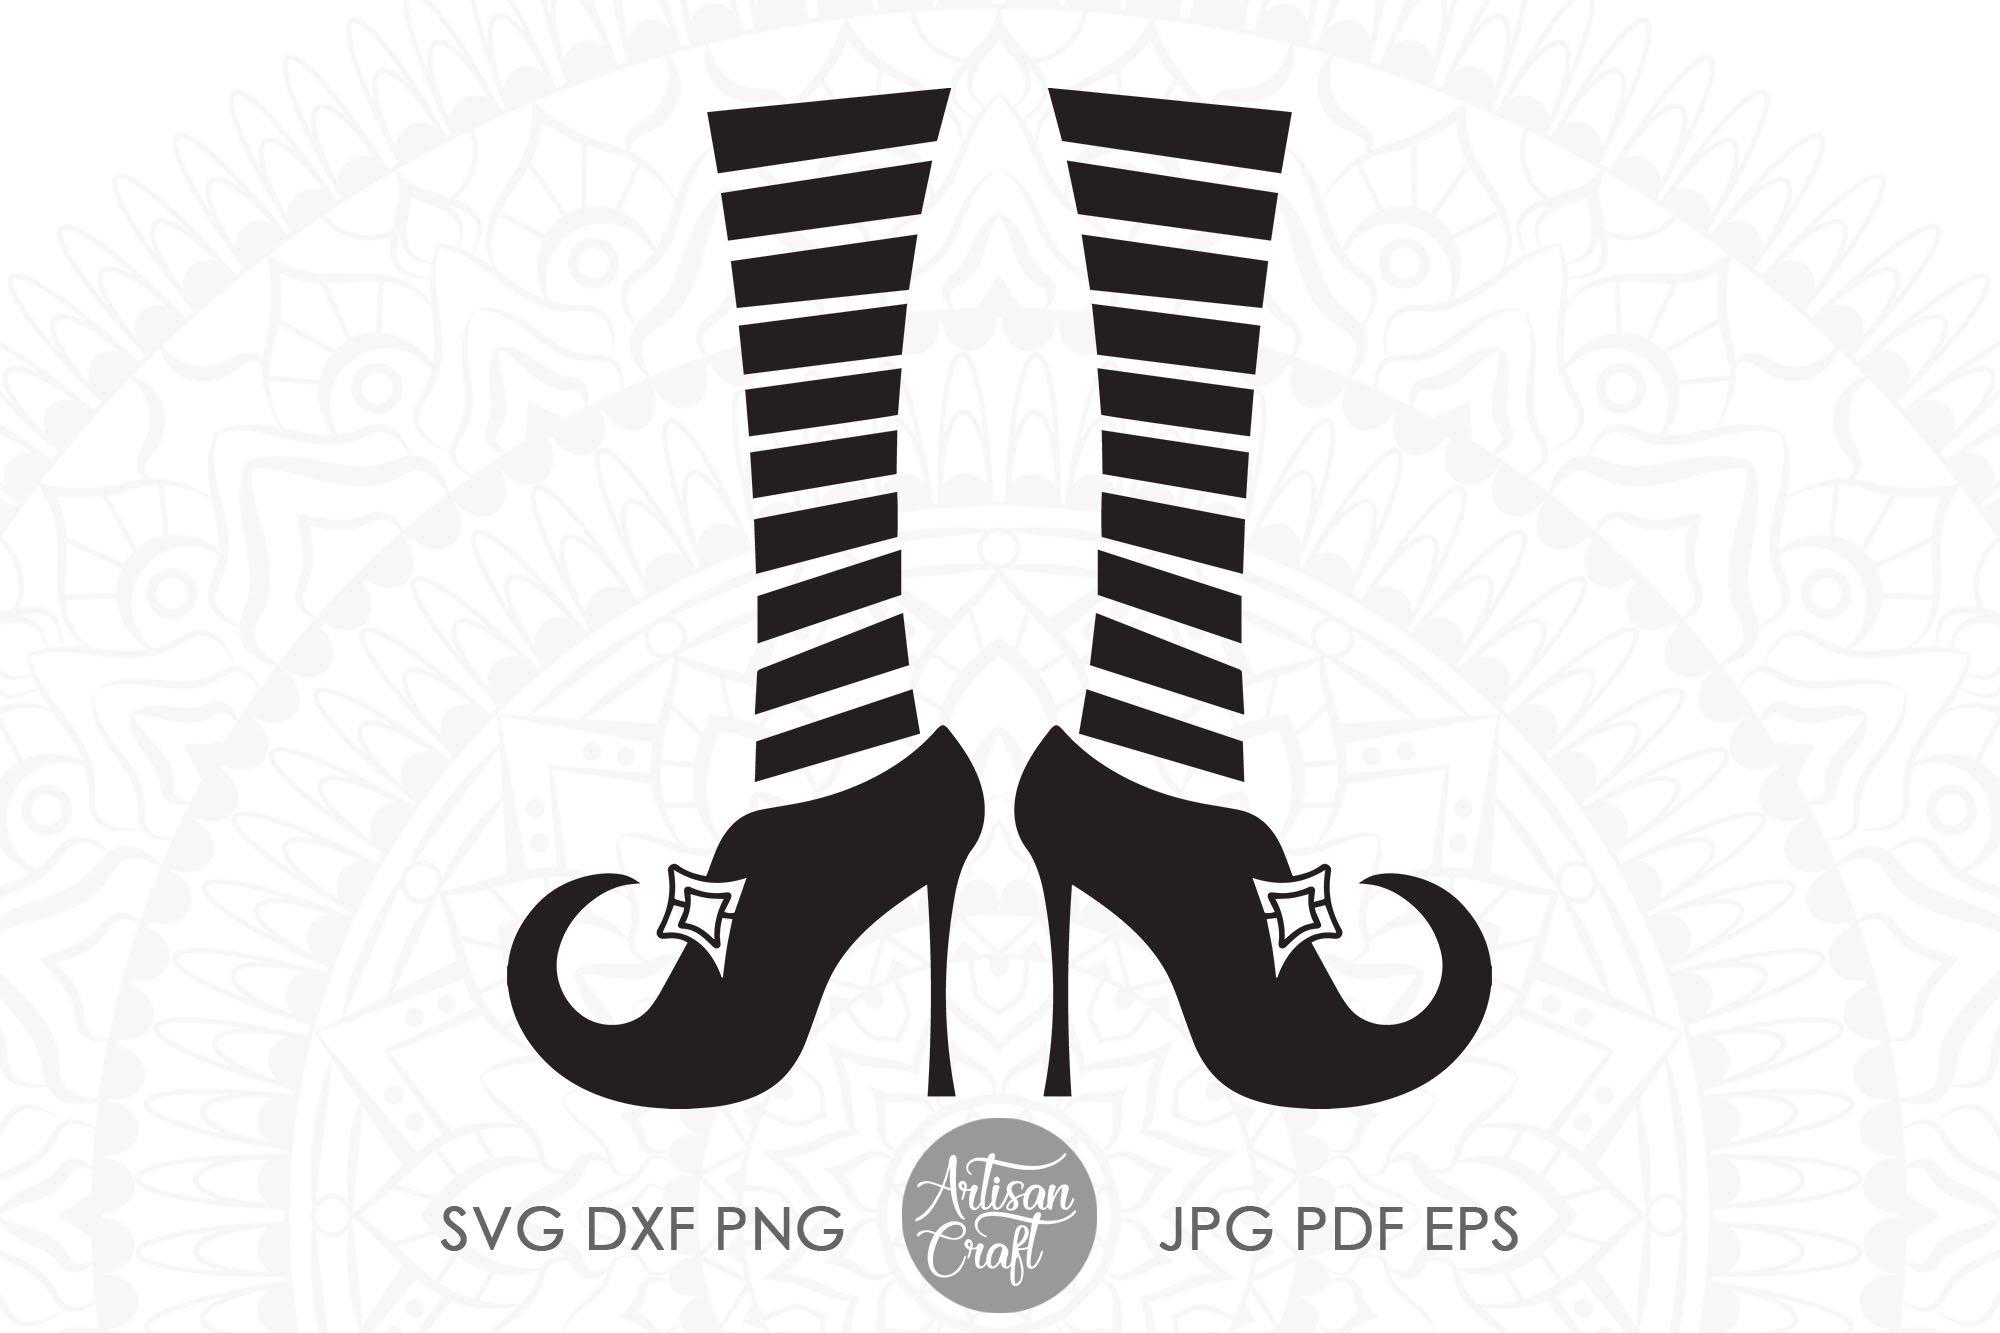 Halloween Witch Witches Legs Svg Clip Art High Heels 706984 Cut Files Design Bundles